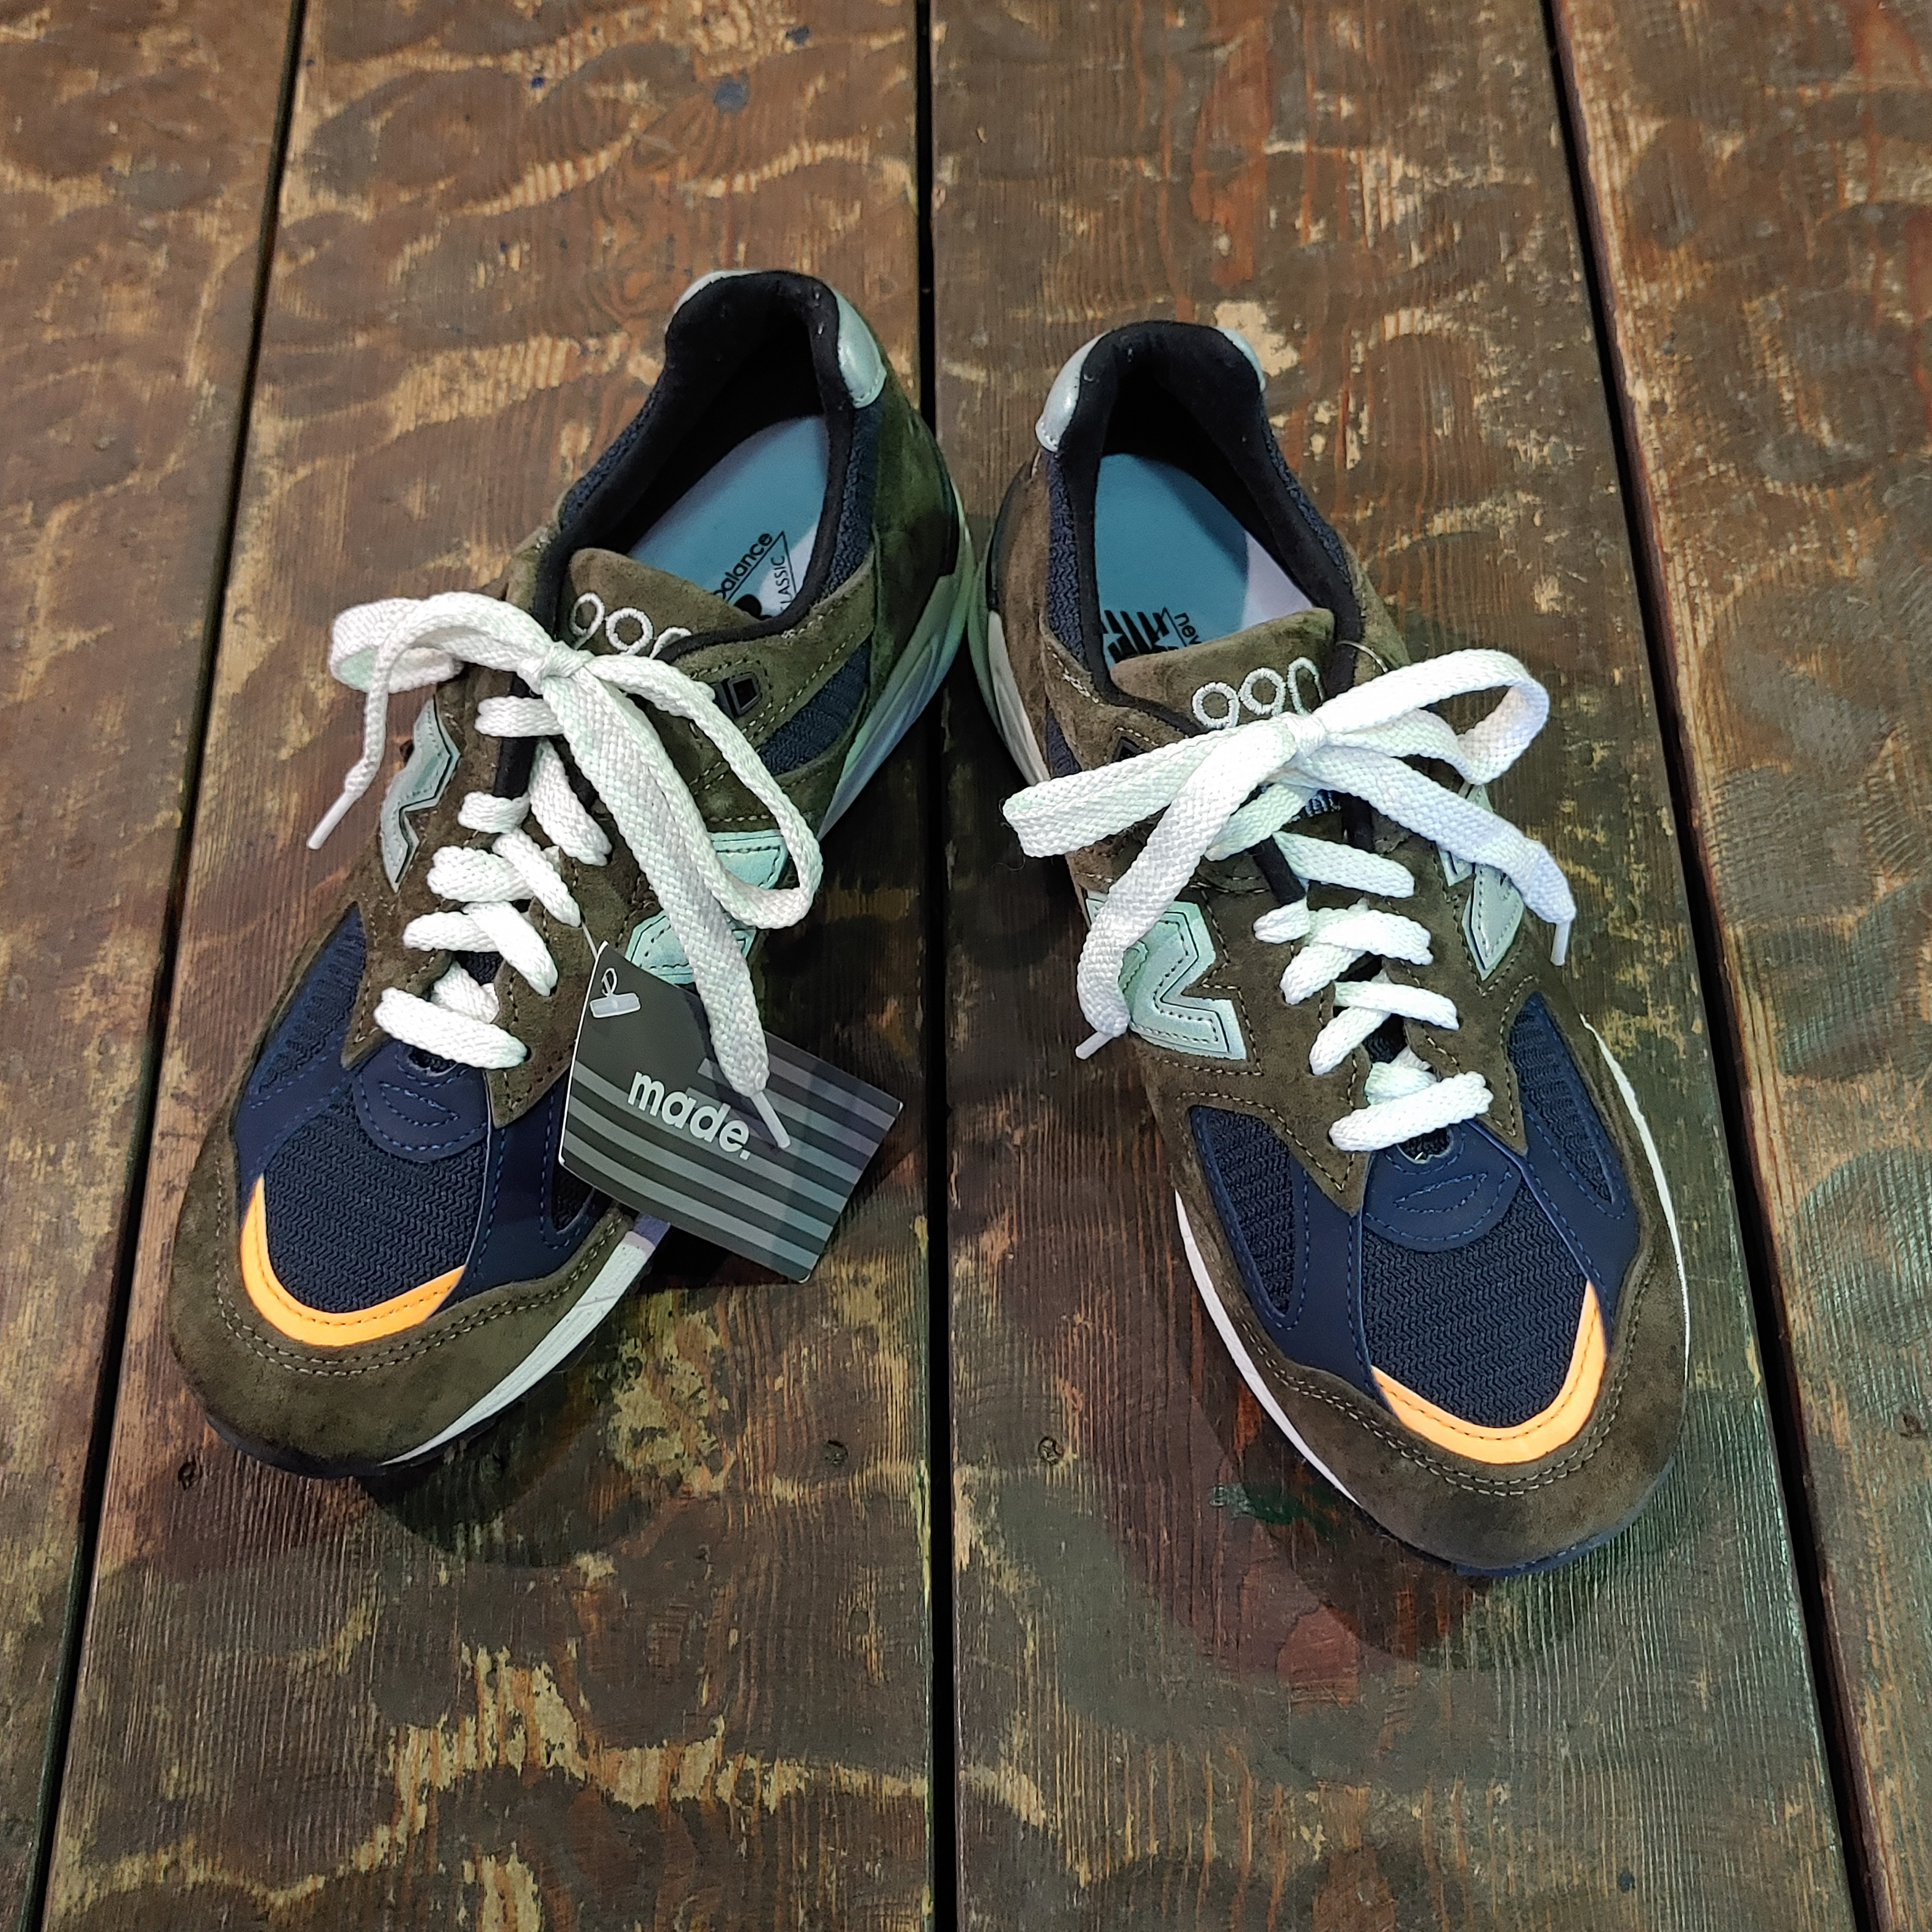 【USA】New Balance 990